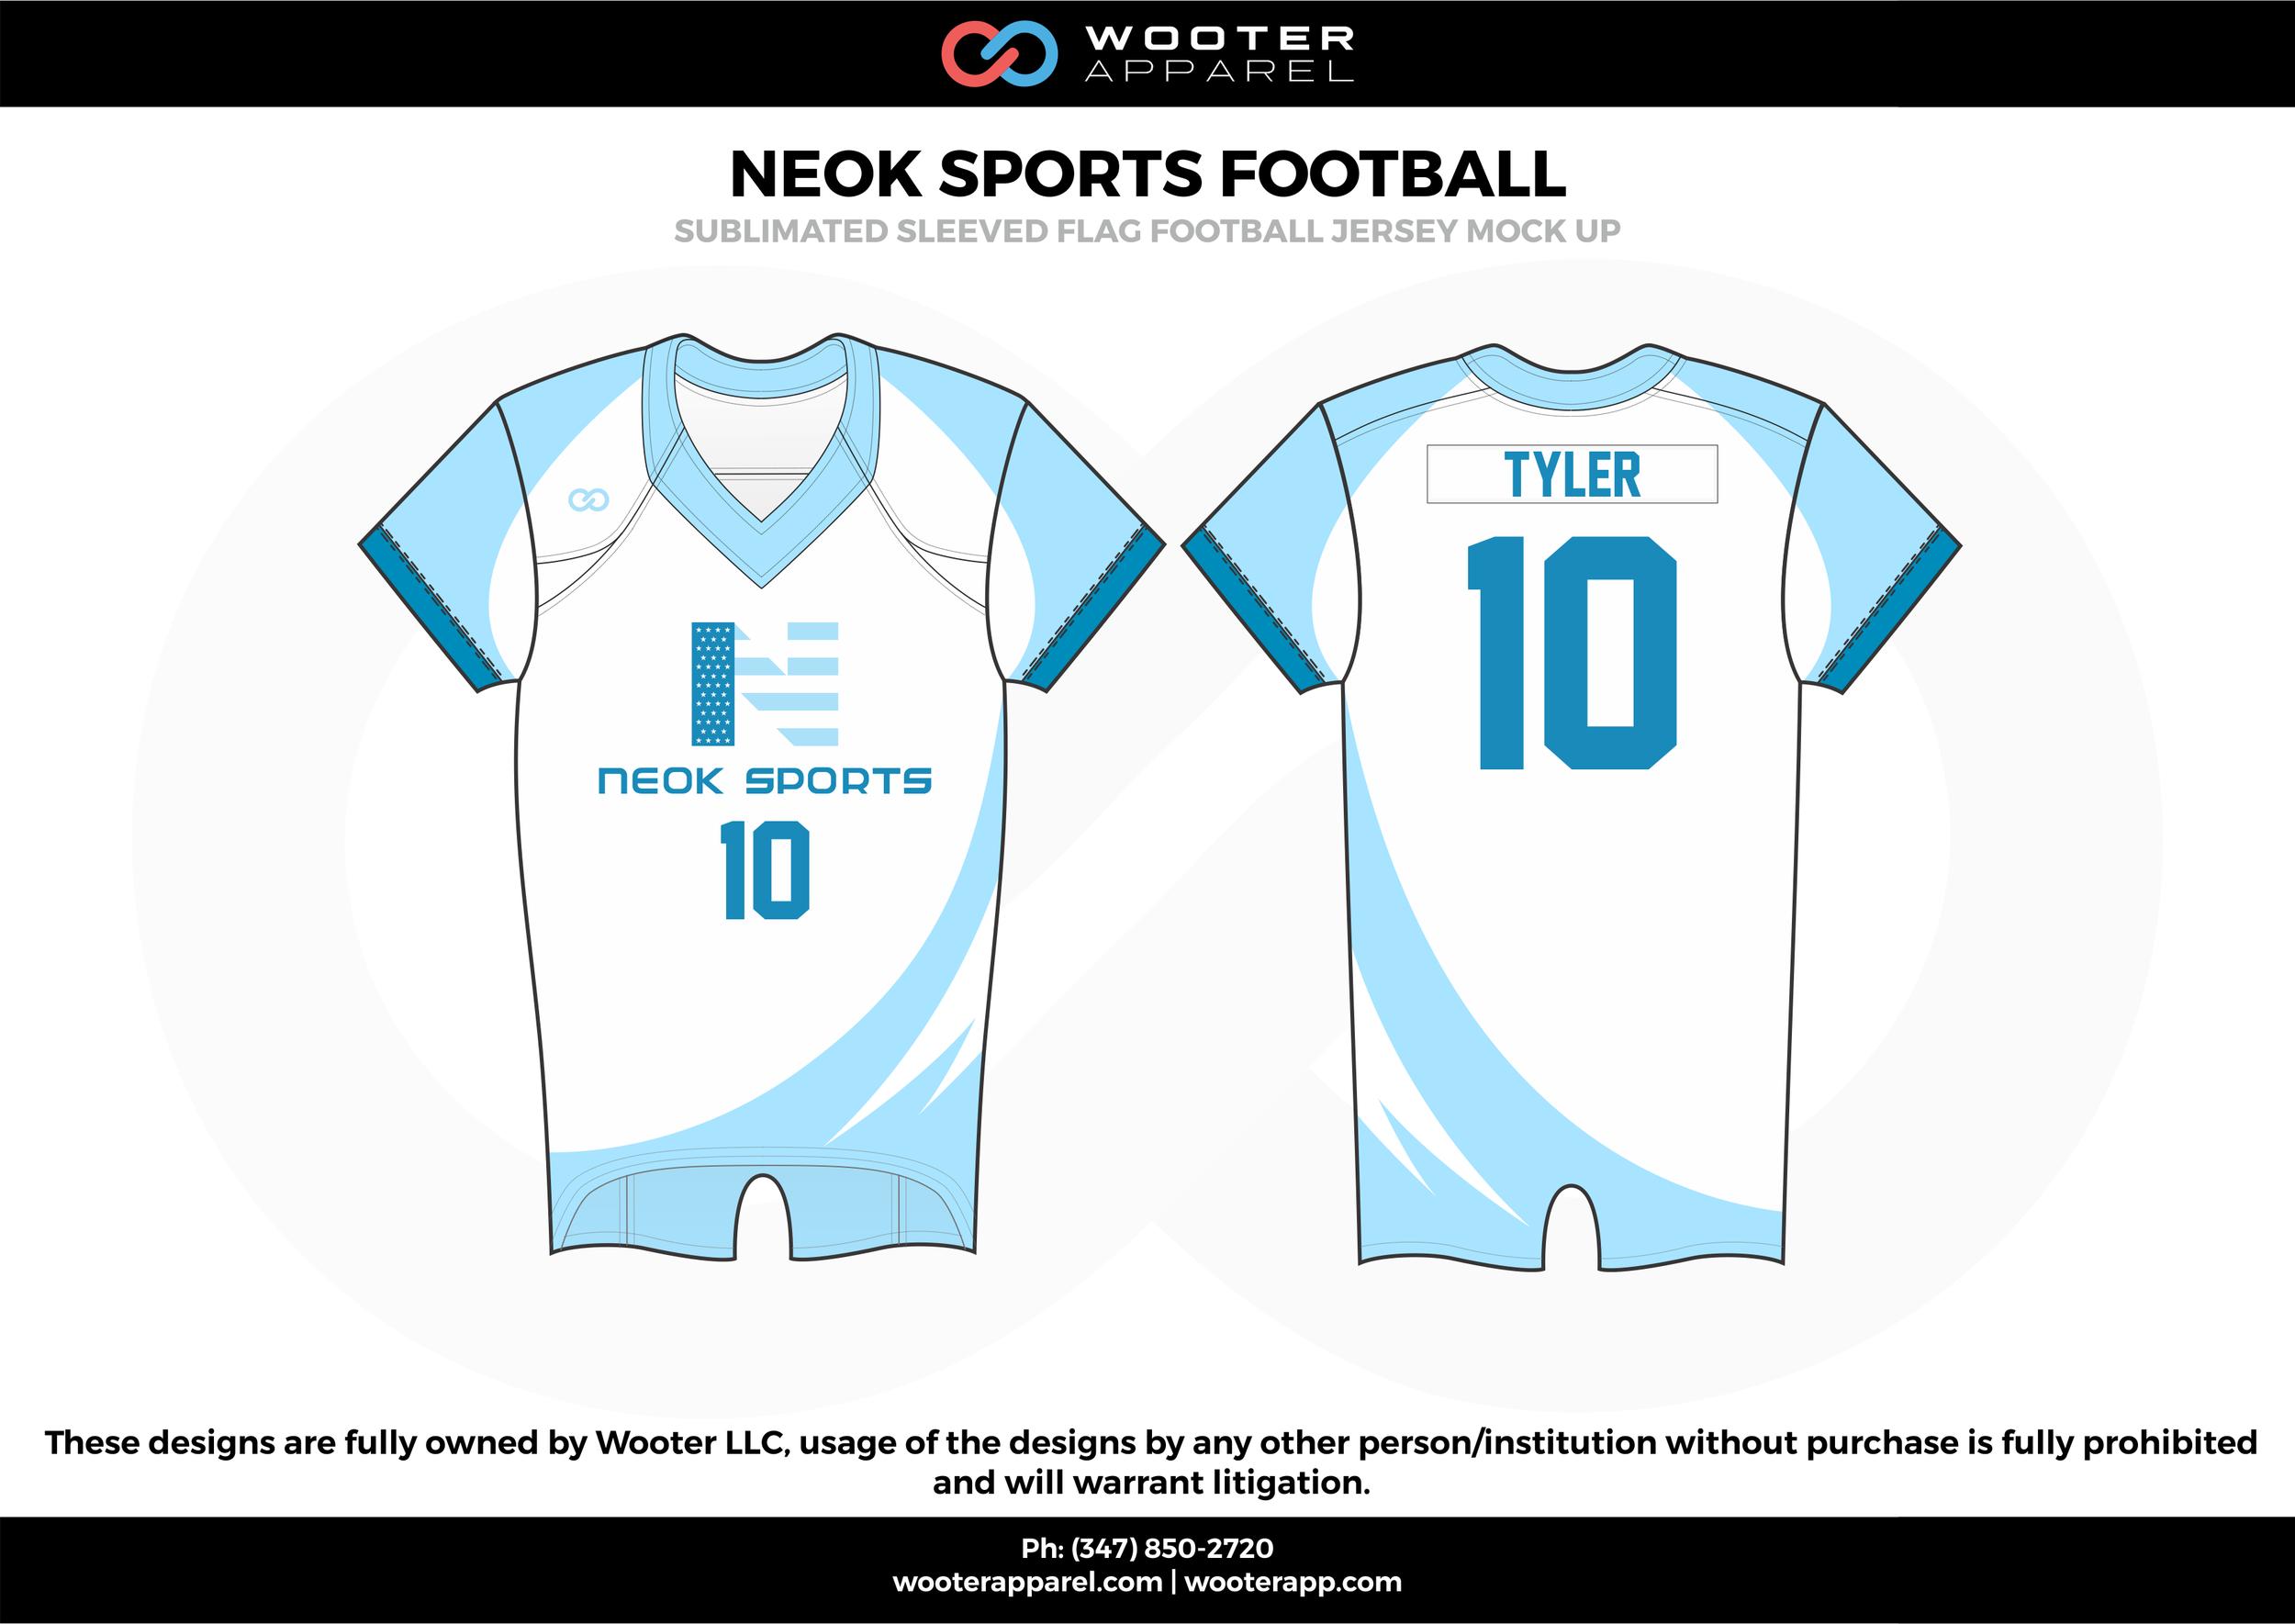 NEOK SPORTS FOOTBALL white blue flag football uniforms jerseys top